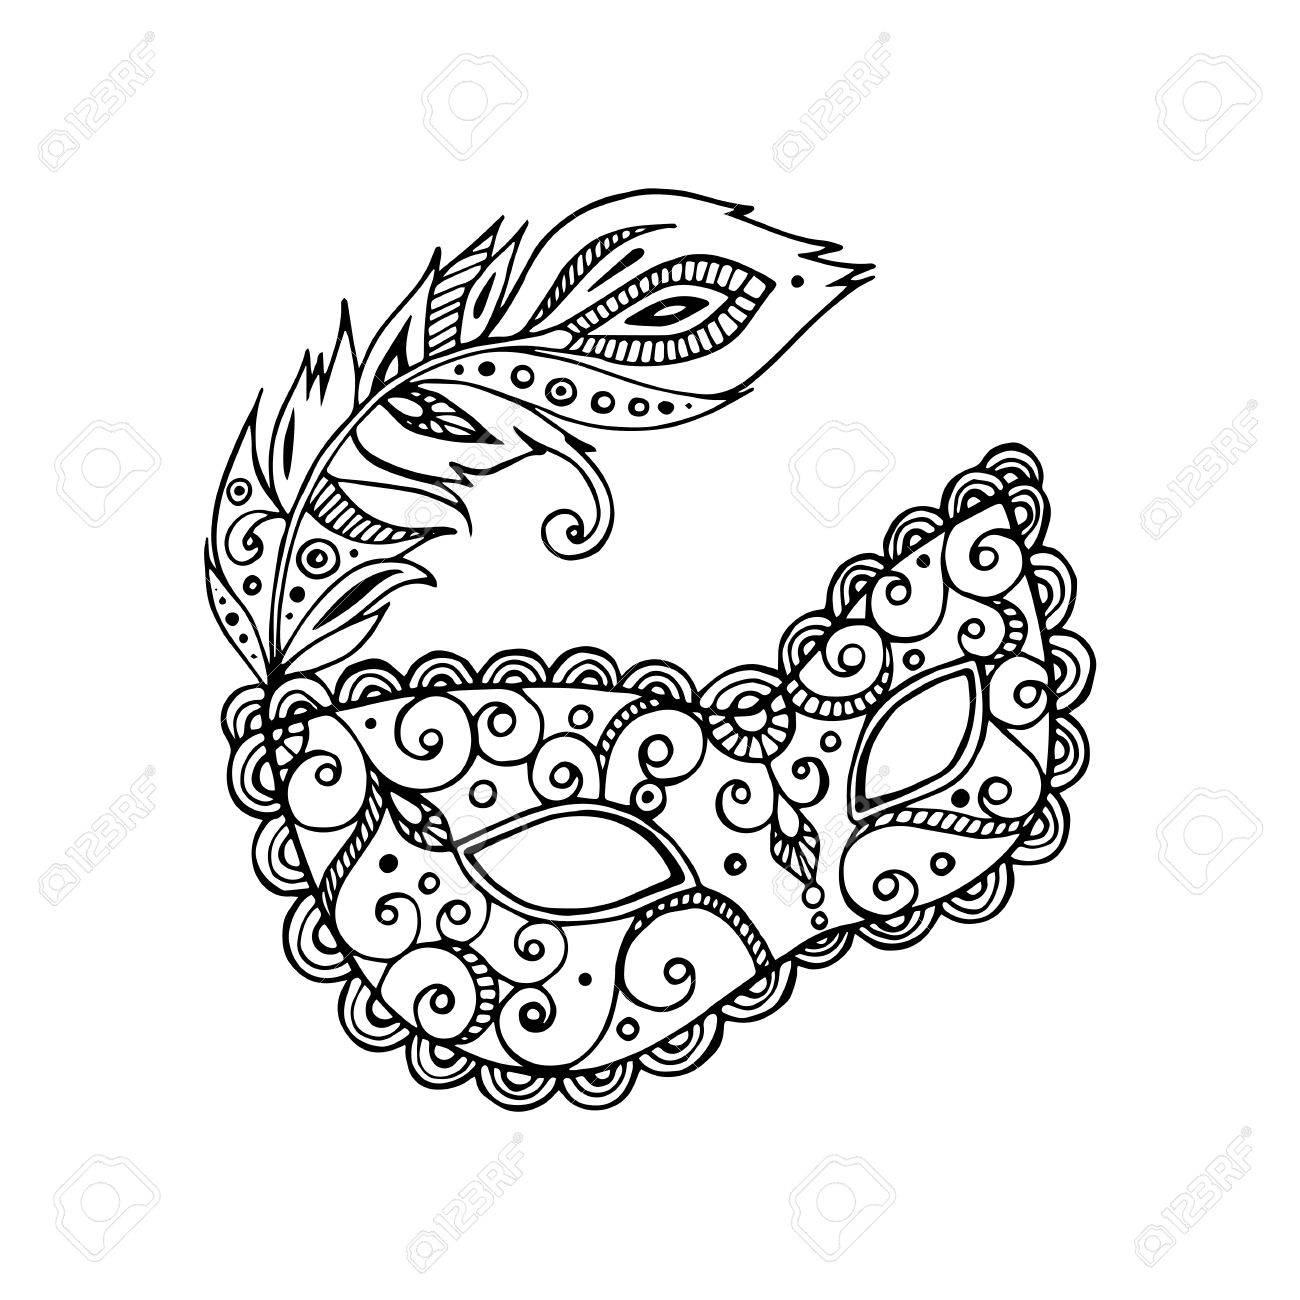 Black Beautiful Ornate Carnival Mardi Gras Mask, Hand Drawn Vector ...